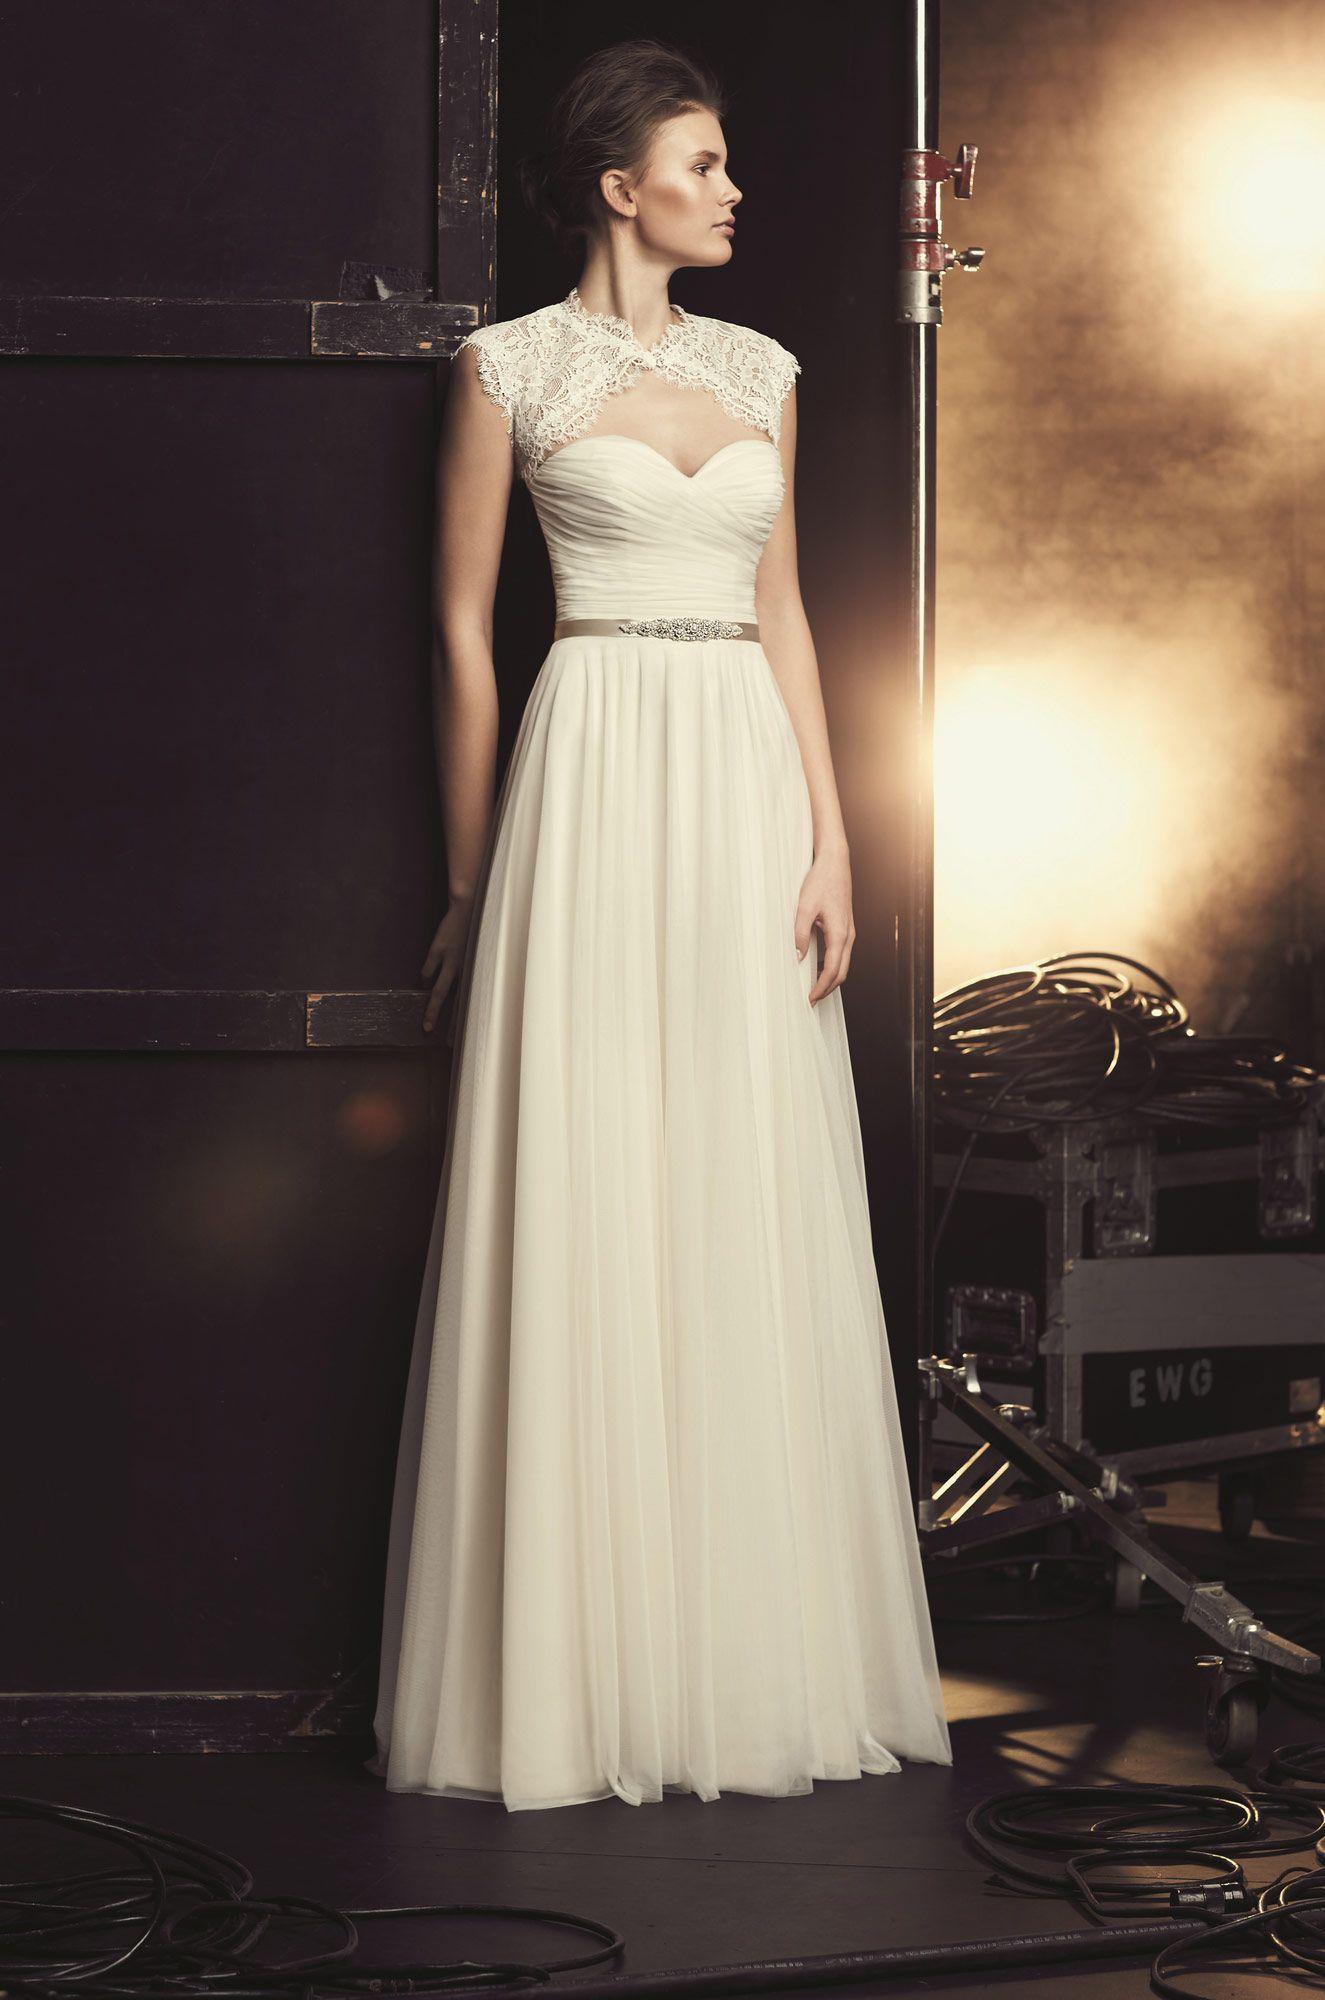 Full tulle wedding dress style mikaella bridal lace